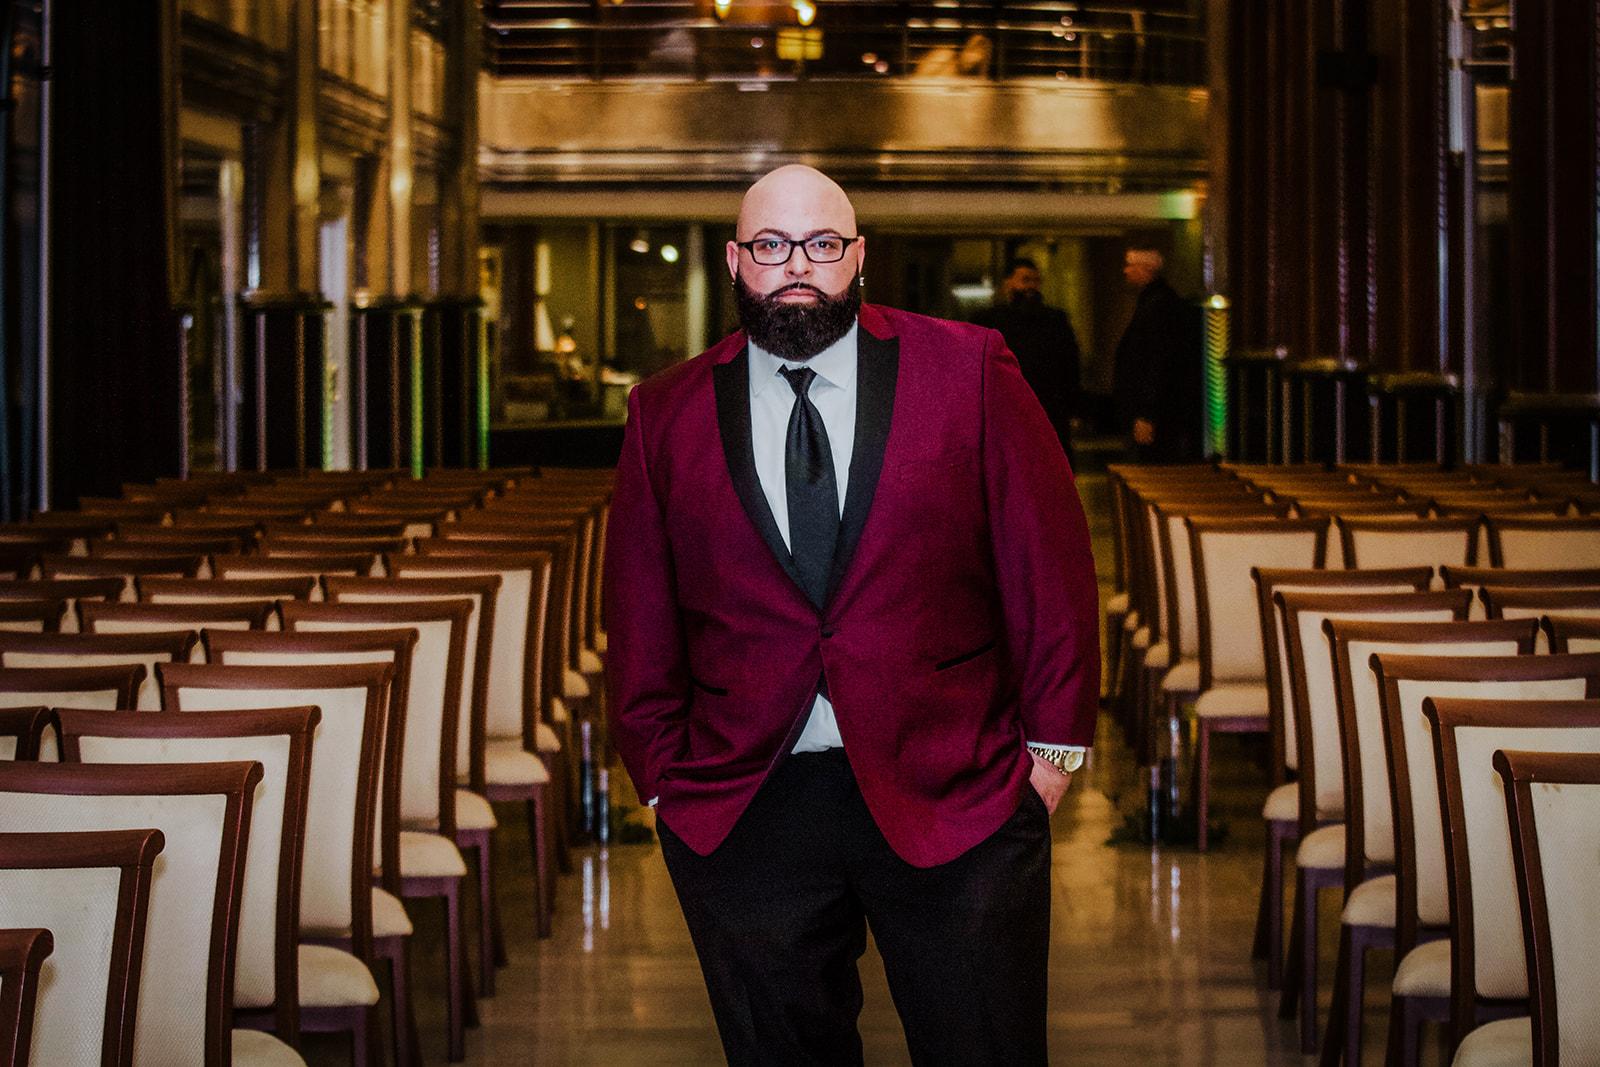 Groom in maroon and black JTGhamo suit at his Hartford Connecticut wedding - Pearl Weddings & Events